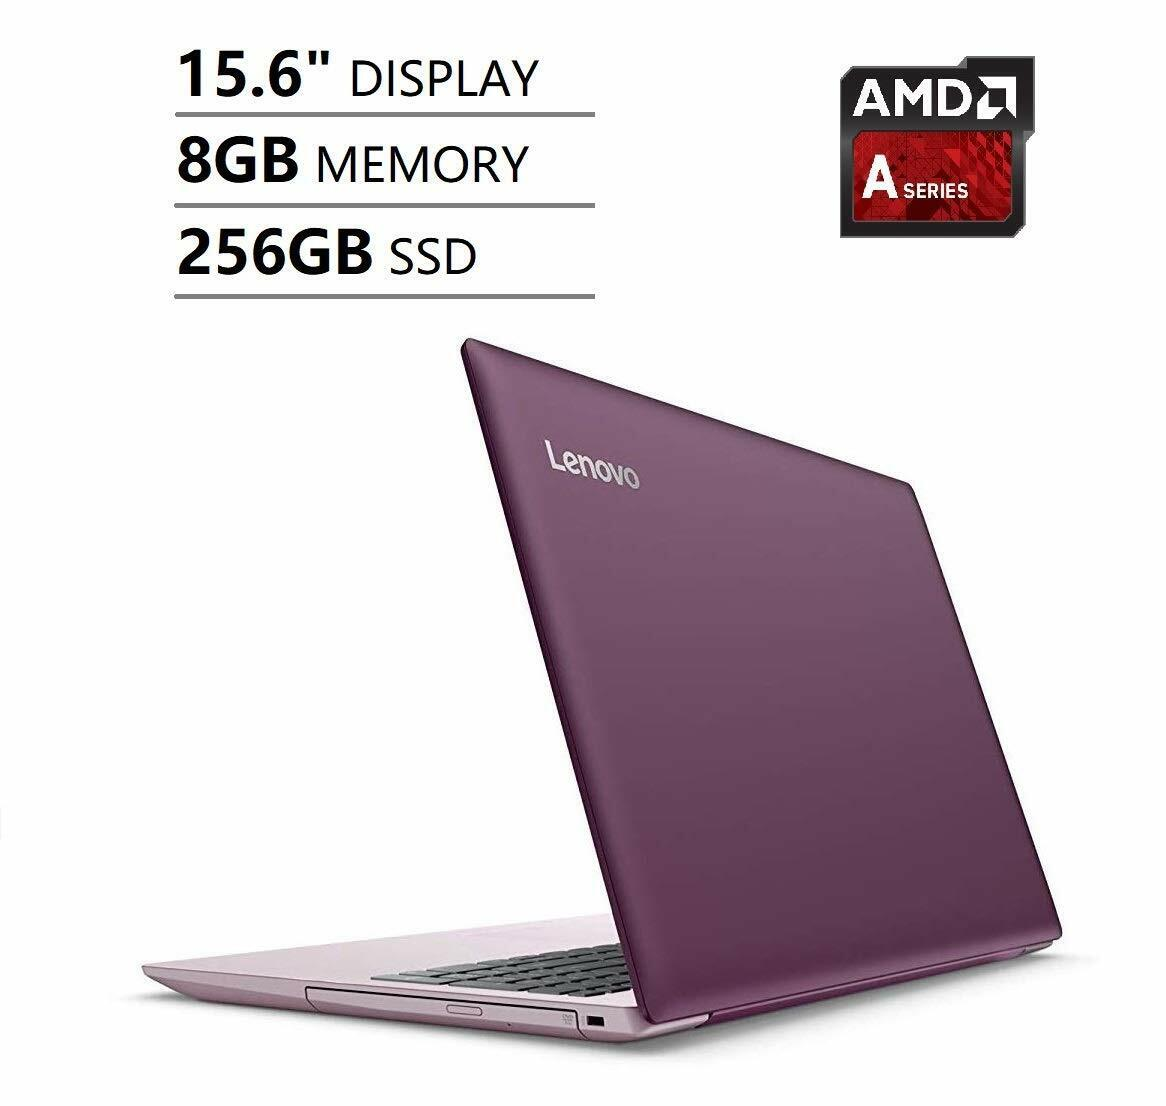 Laptop Windows - NEW Lenovo IdeaPad HD 15.6 Dual Core 3.10GHz 256GB SSD 8GB RAM Windows 10 Plum